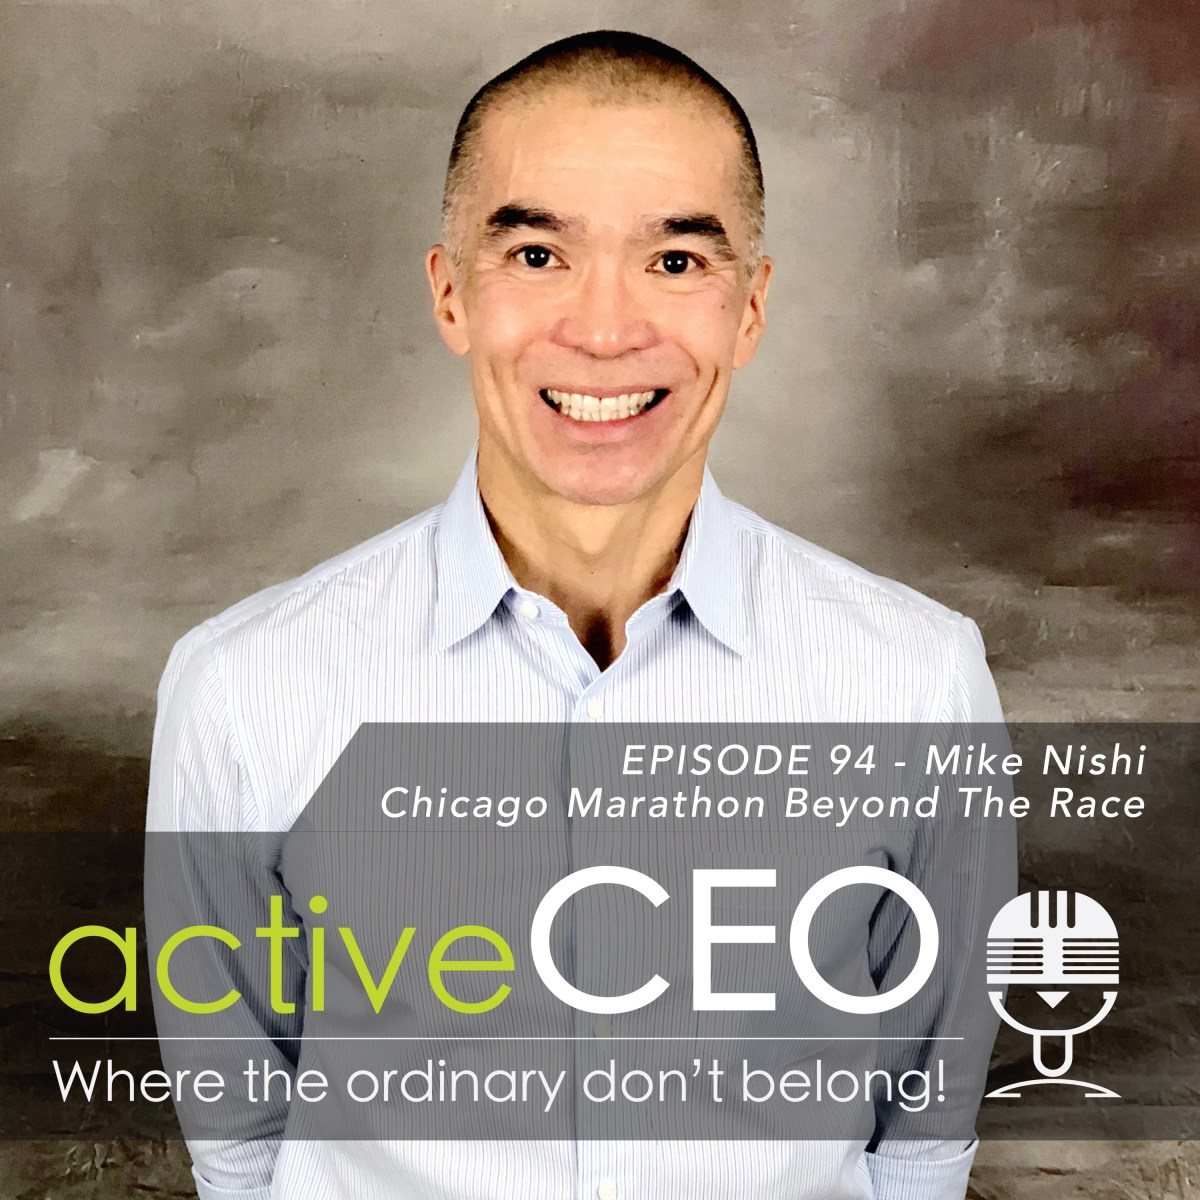 active CEO Podcast Mike Nishi Chicago Event Management Chicago Marathon Beyond The Race Craig Johns Speaker